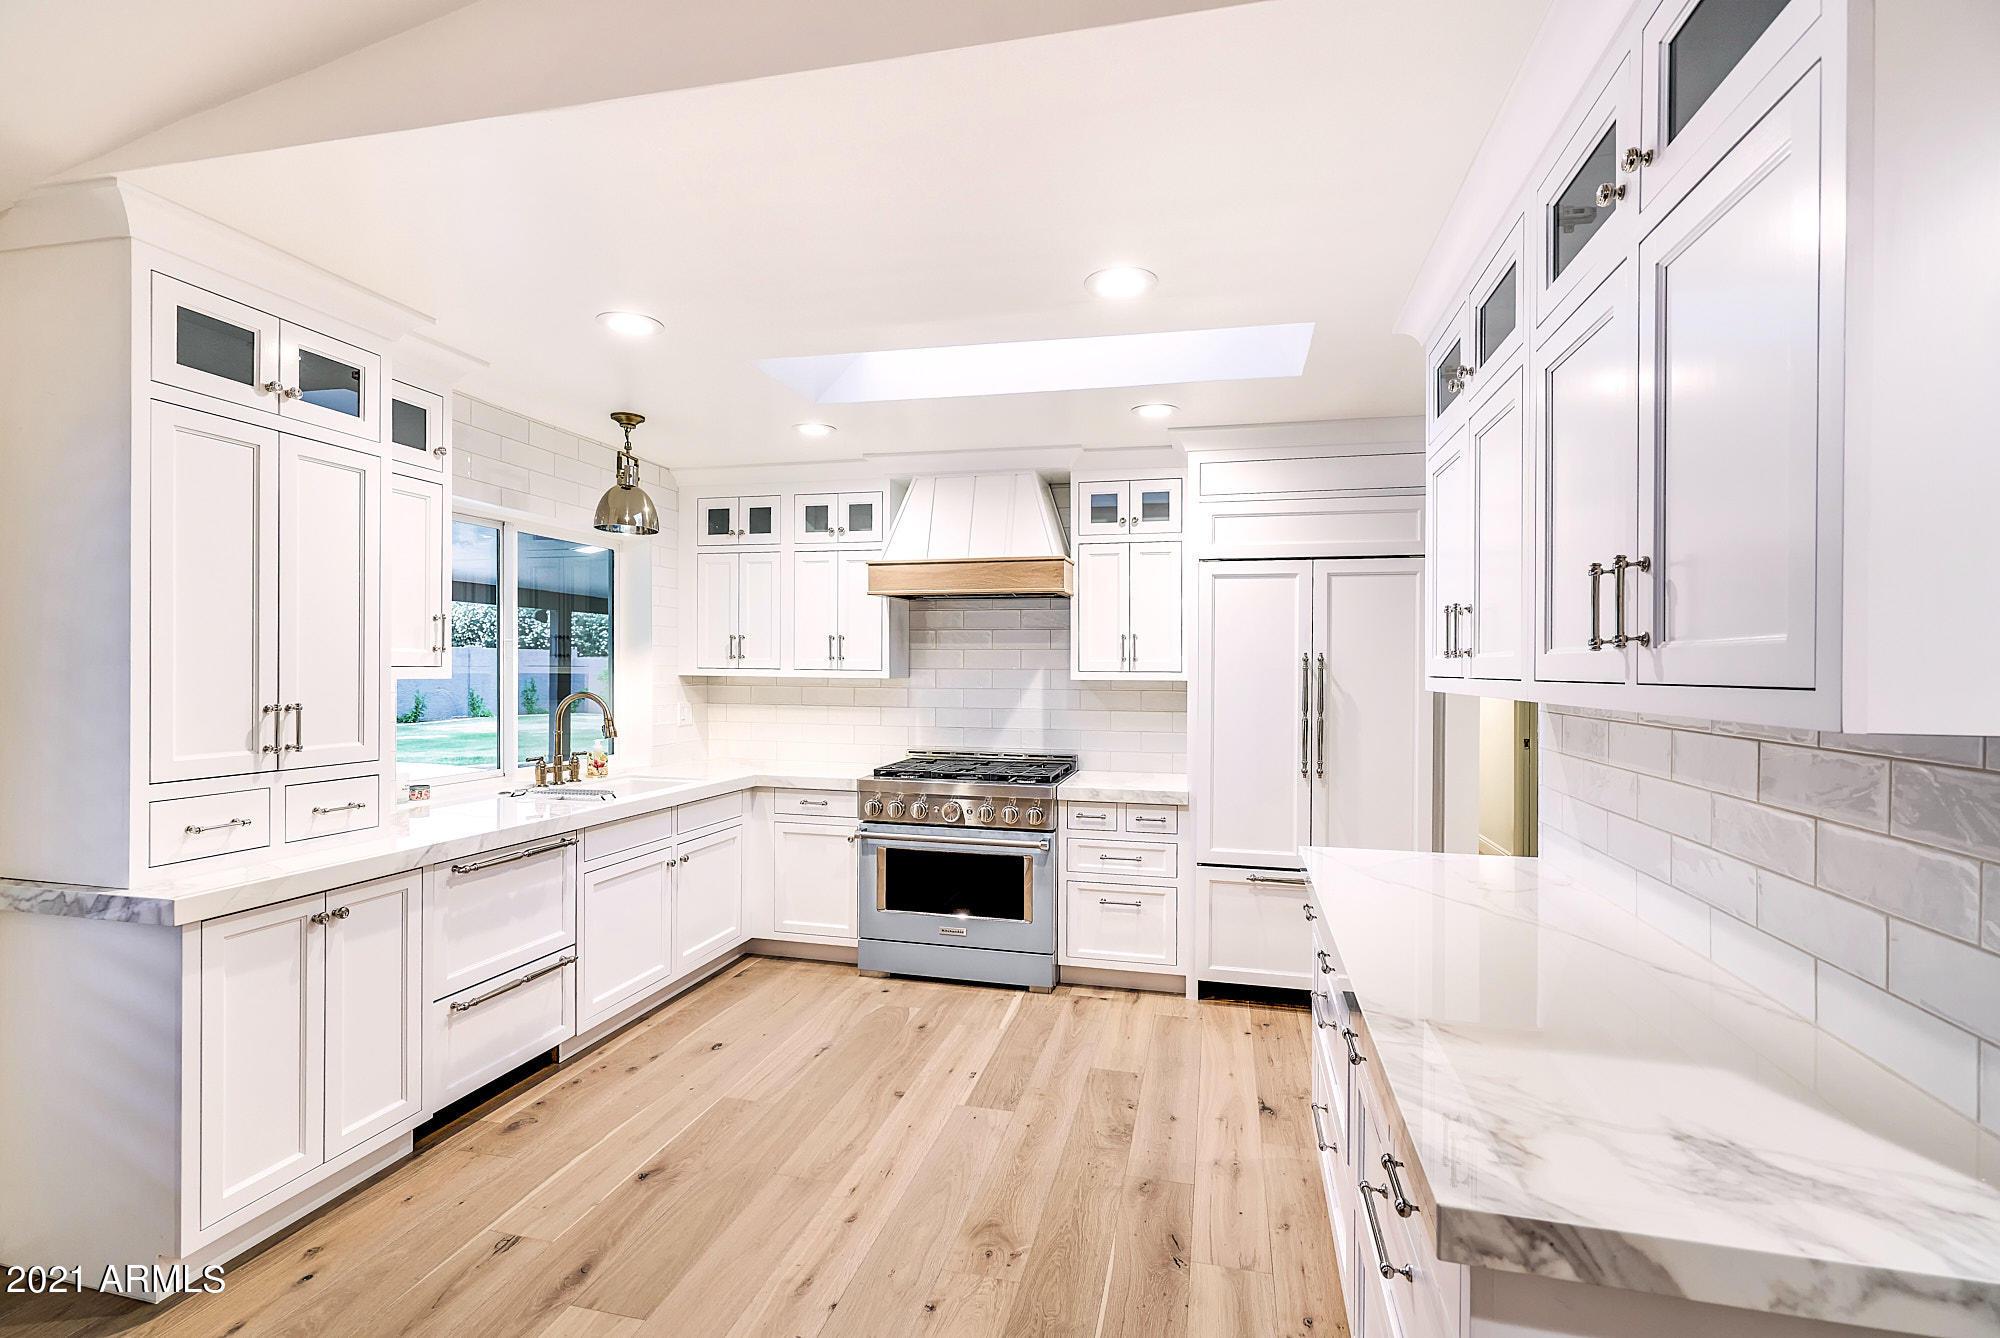 6340 E CALLE DEL NORTE --, Scottsdale, AZ 85251, 4 Bedrooms Bedrooms, ,Residential,For Sale,6340 E CALLE DEL NORTE --,6238858